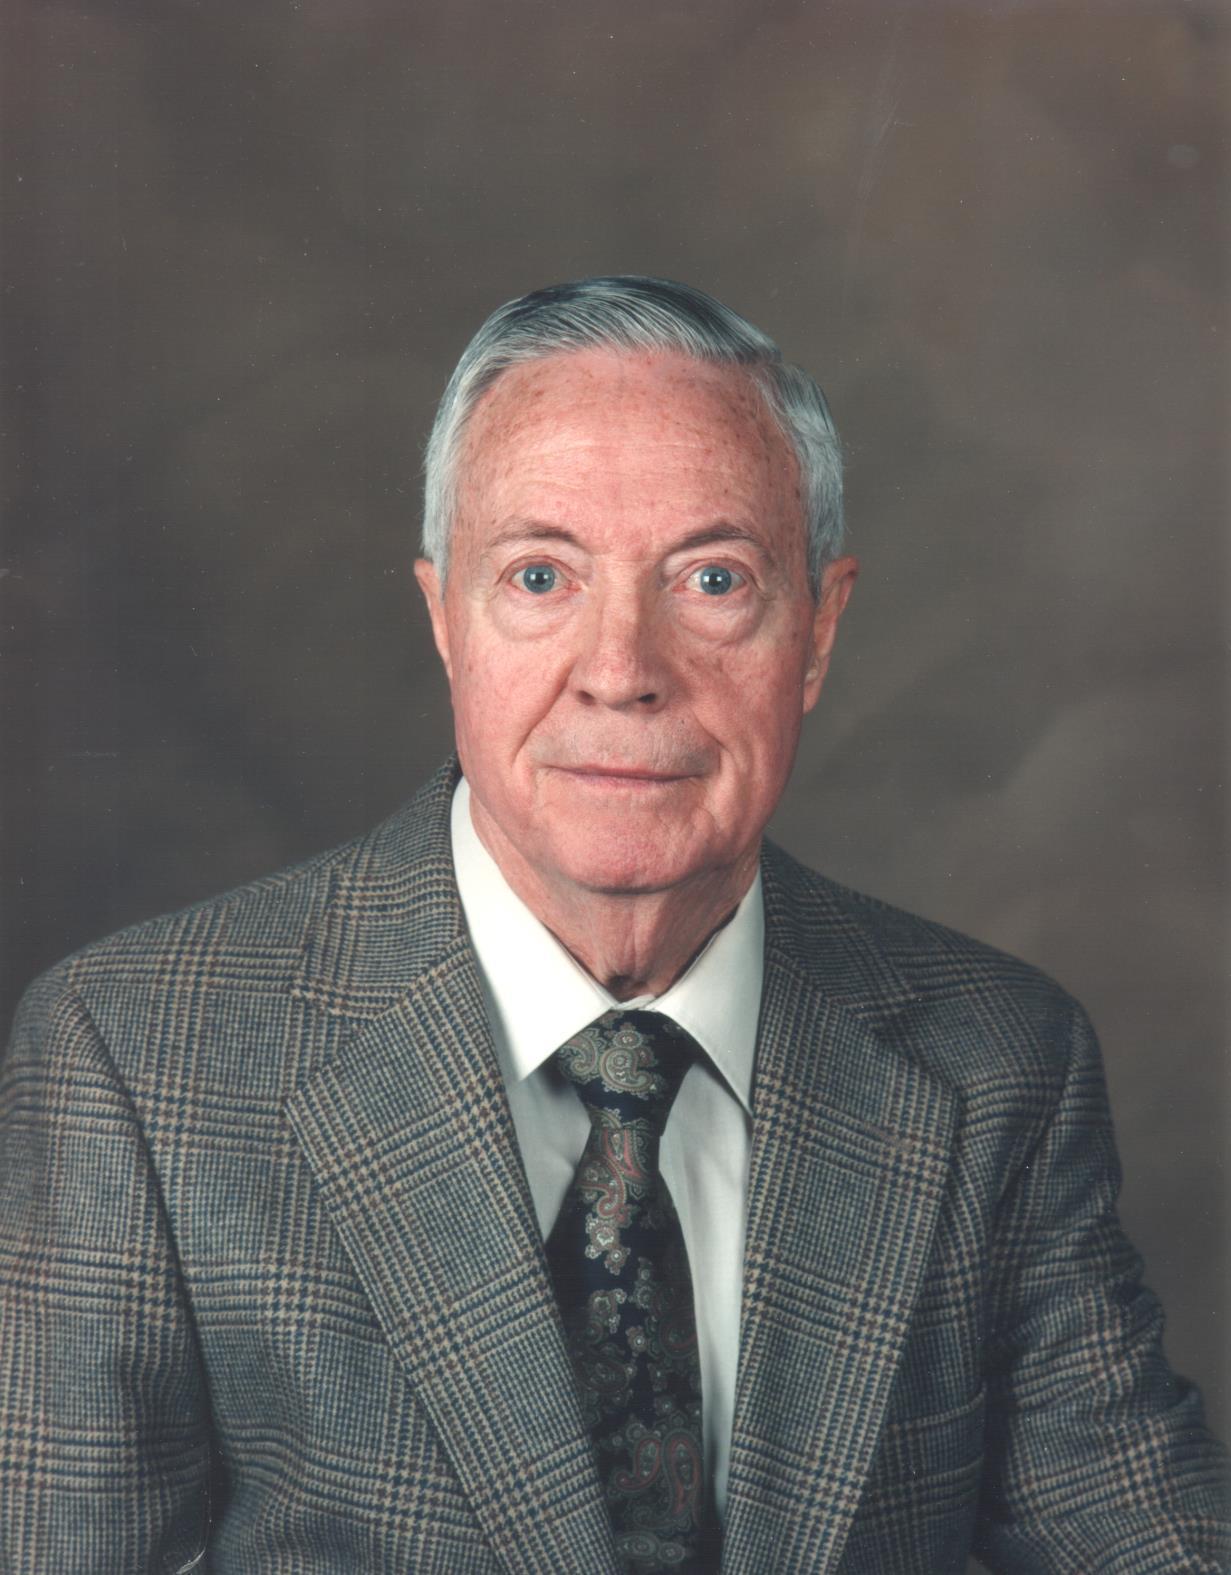 Archie B. Perkins